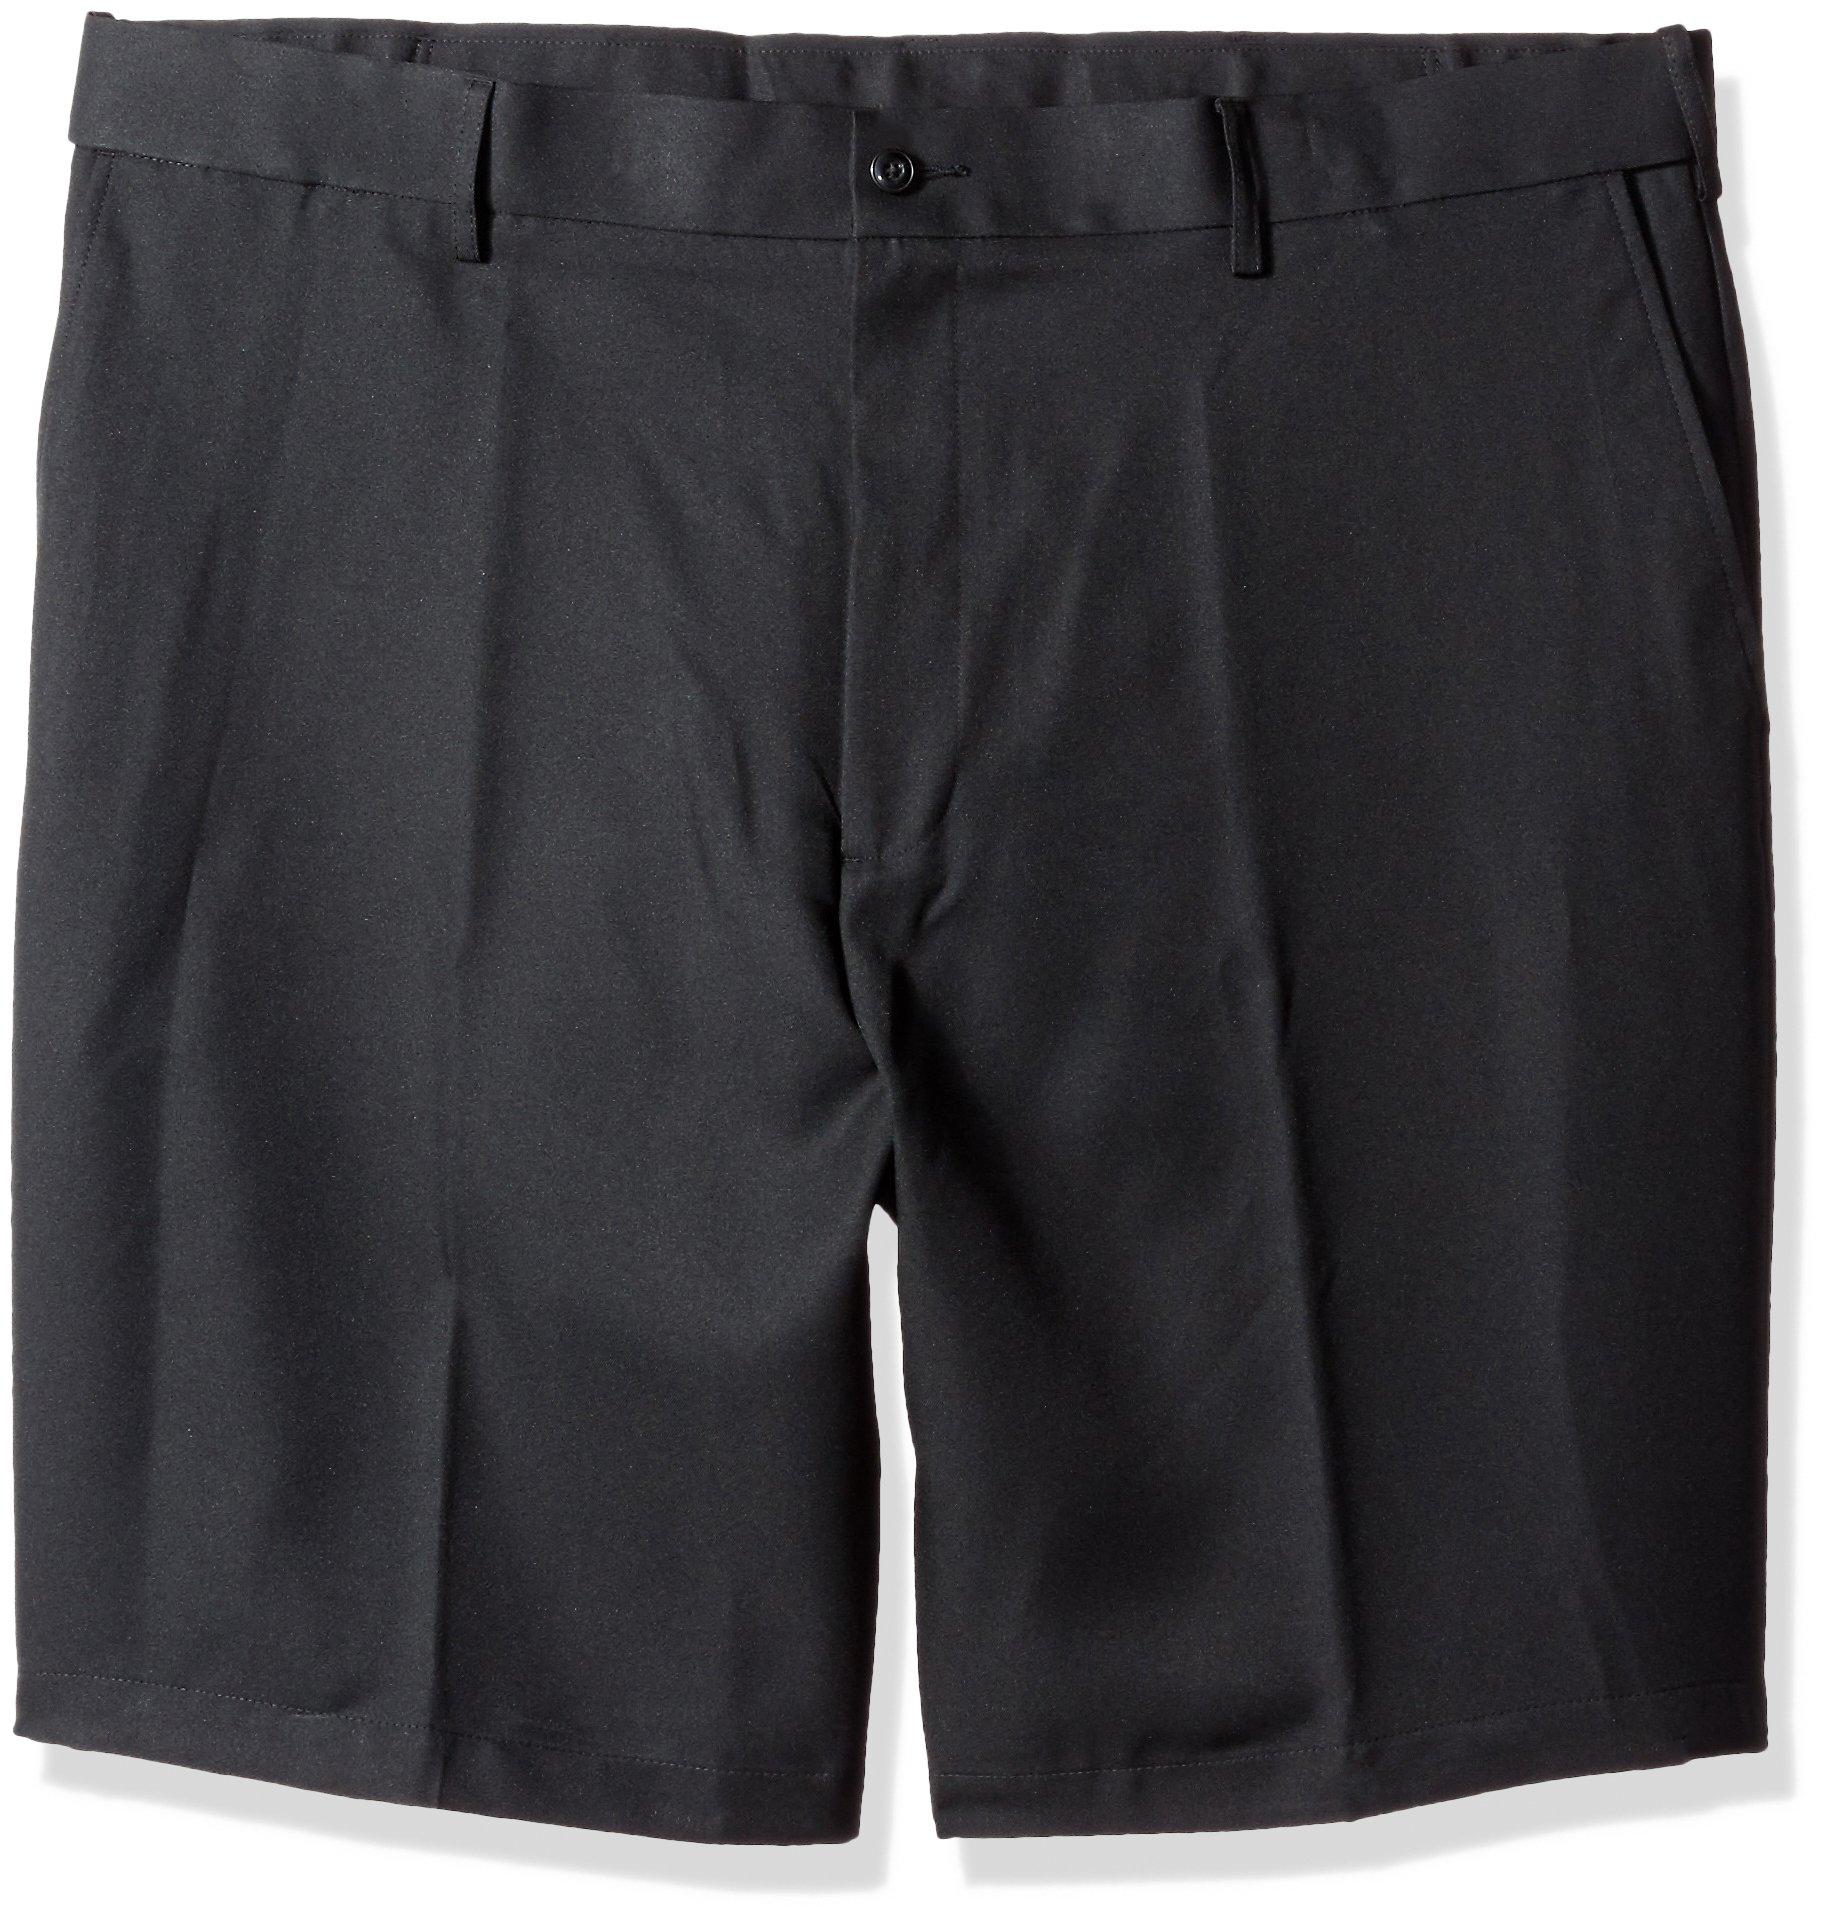 best rated in men u0026 39 s golf shorts  u0026 helpful customer reviews